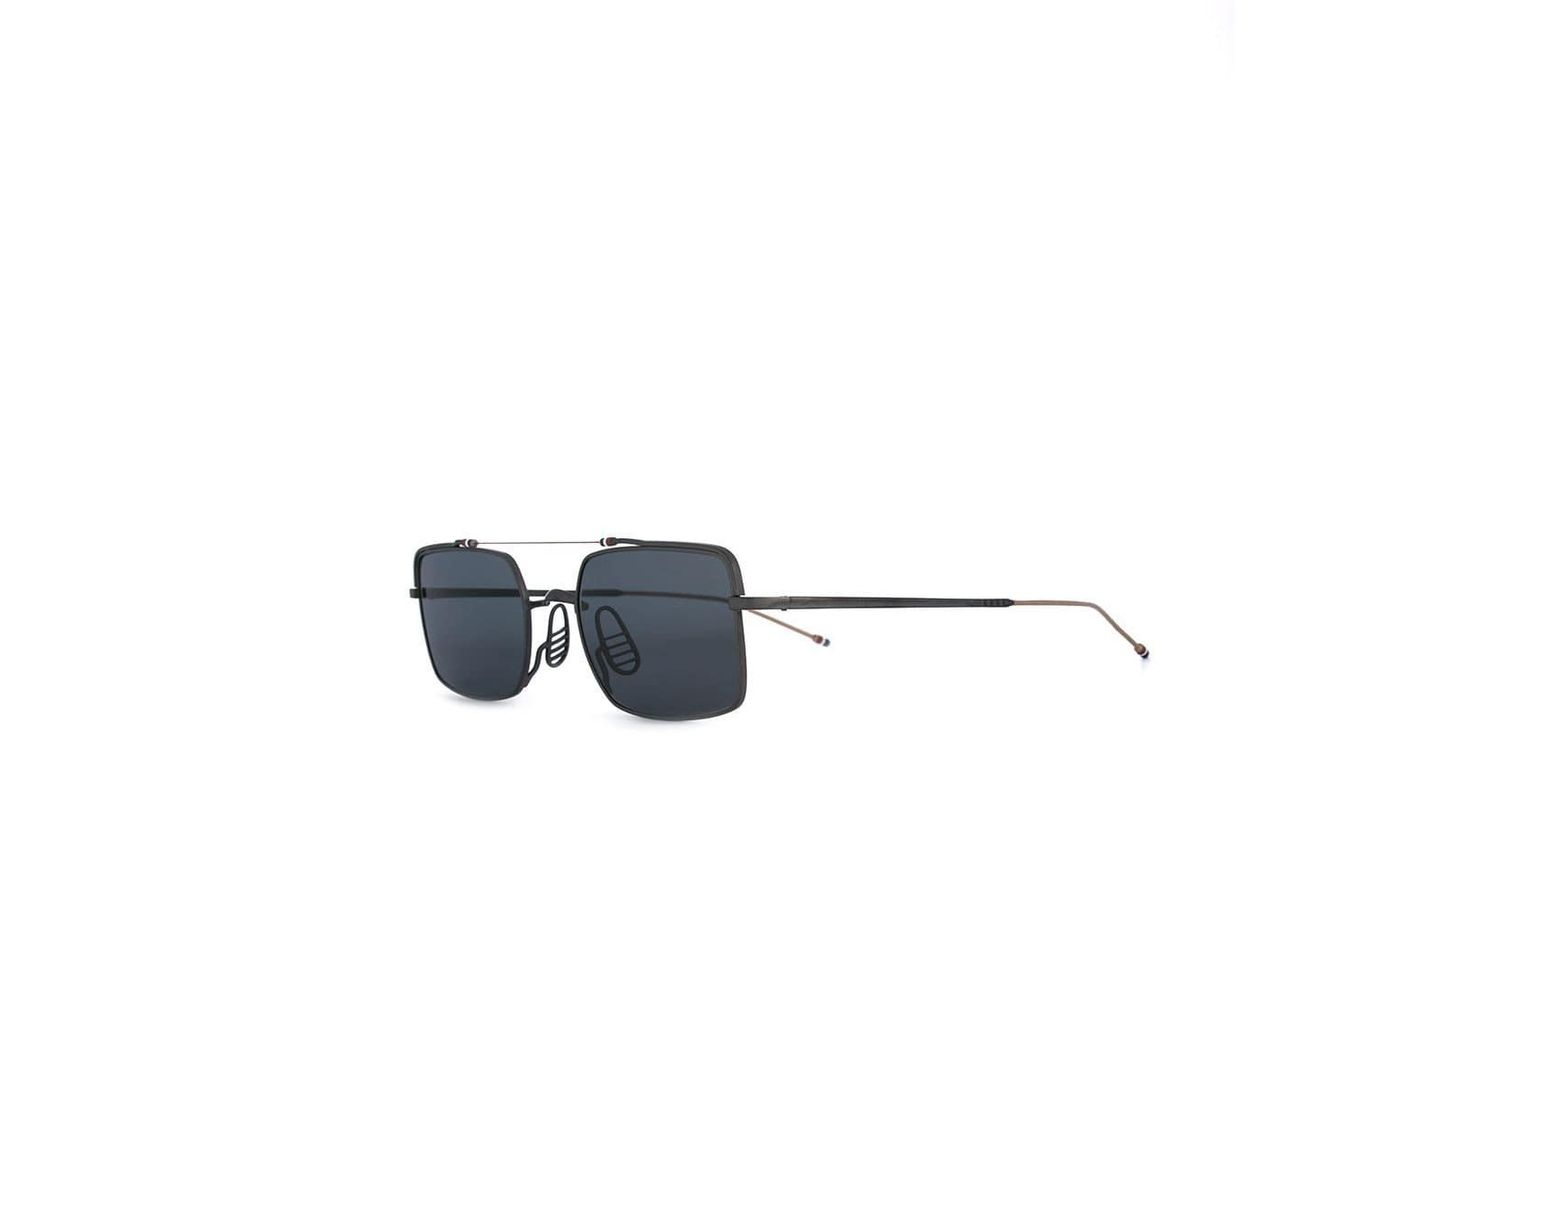 08d3364b46b5 Thom Browne Rectangle Frame Sunglasses in Black for Men - Lyst